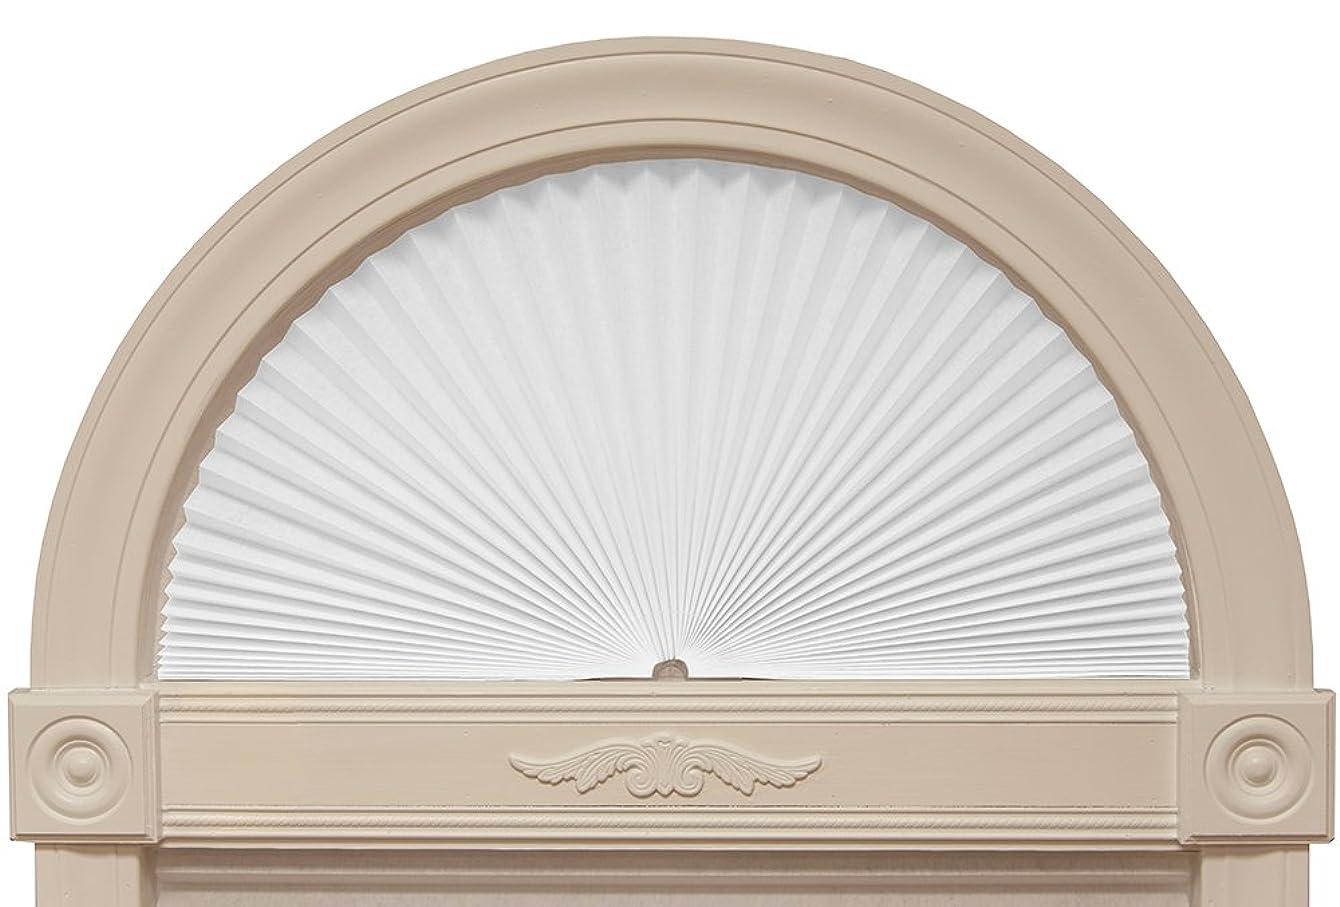 "Original Arch Light Filtering Fabric Shade, White, 72"" x 36"""